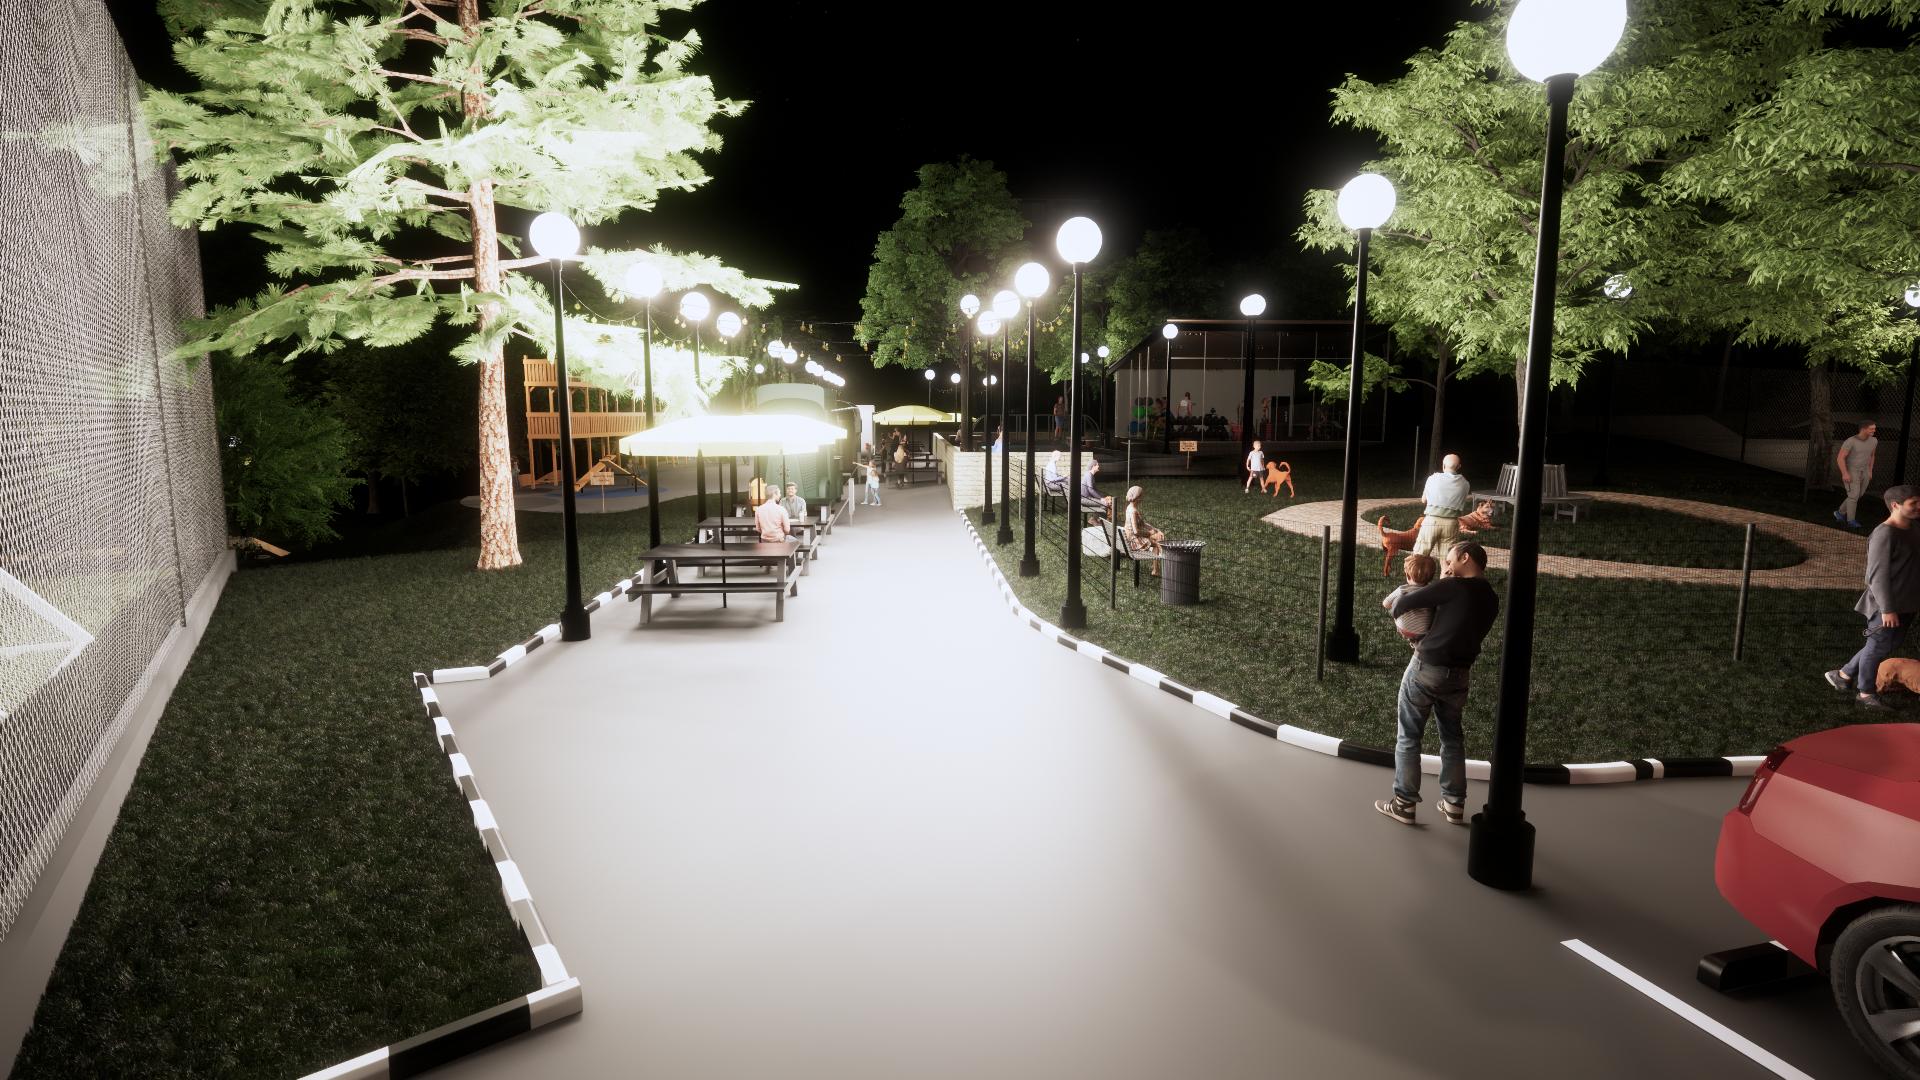 Park 3D Rendering Service, BIM Modelling, Convert to BIM Service